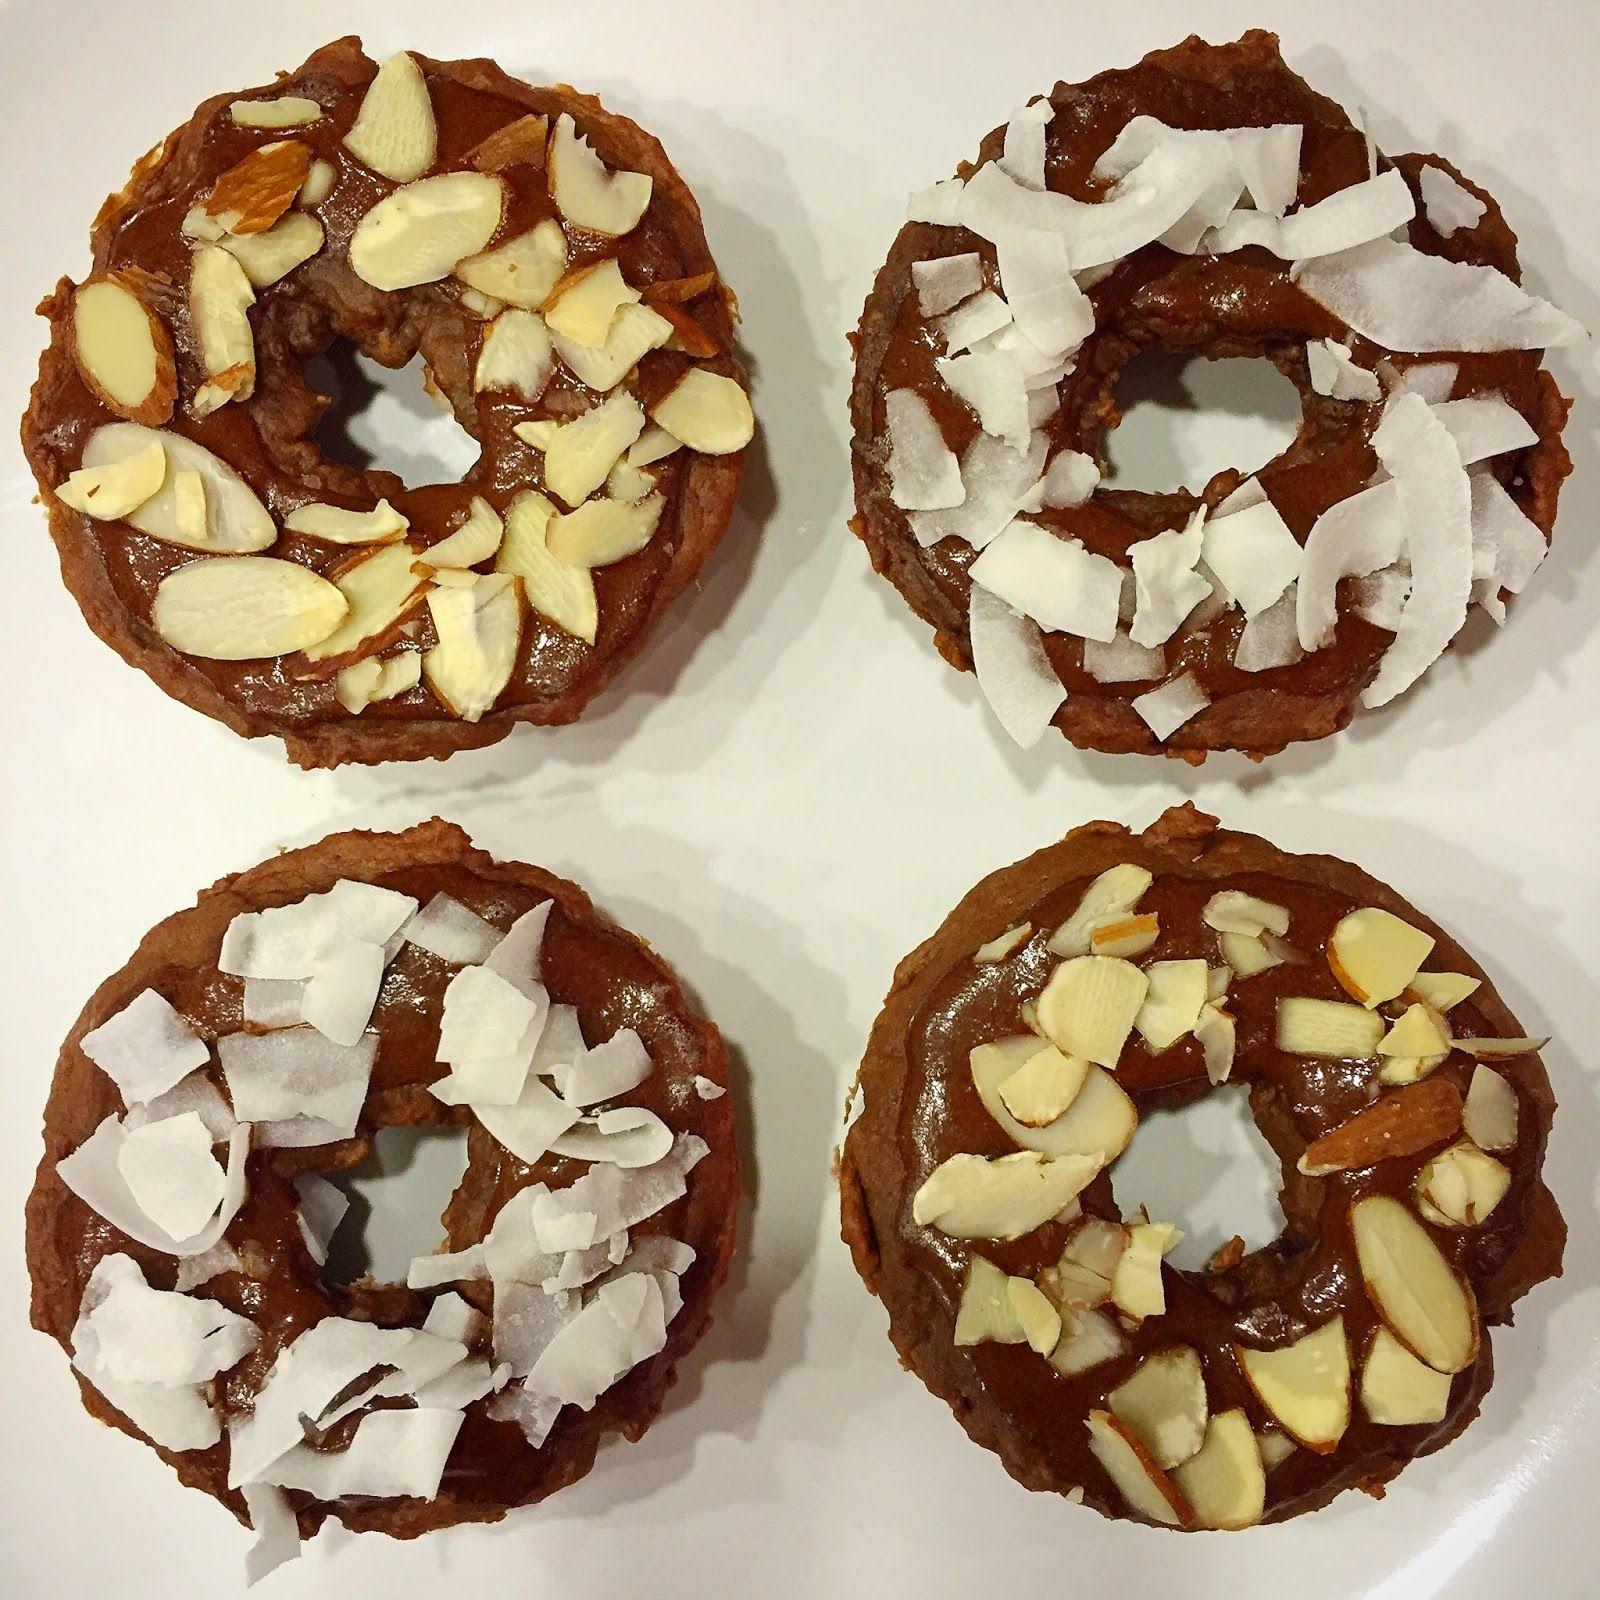 Vegan Chocolate Baked Donuts